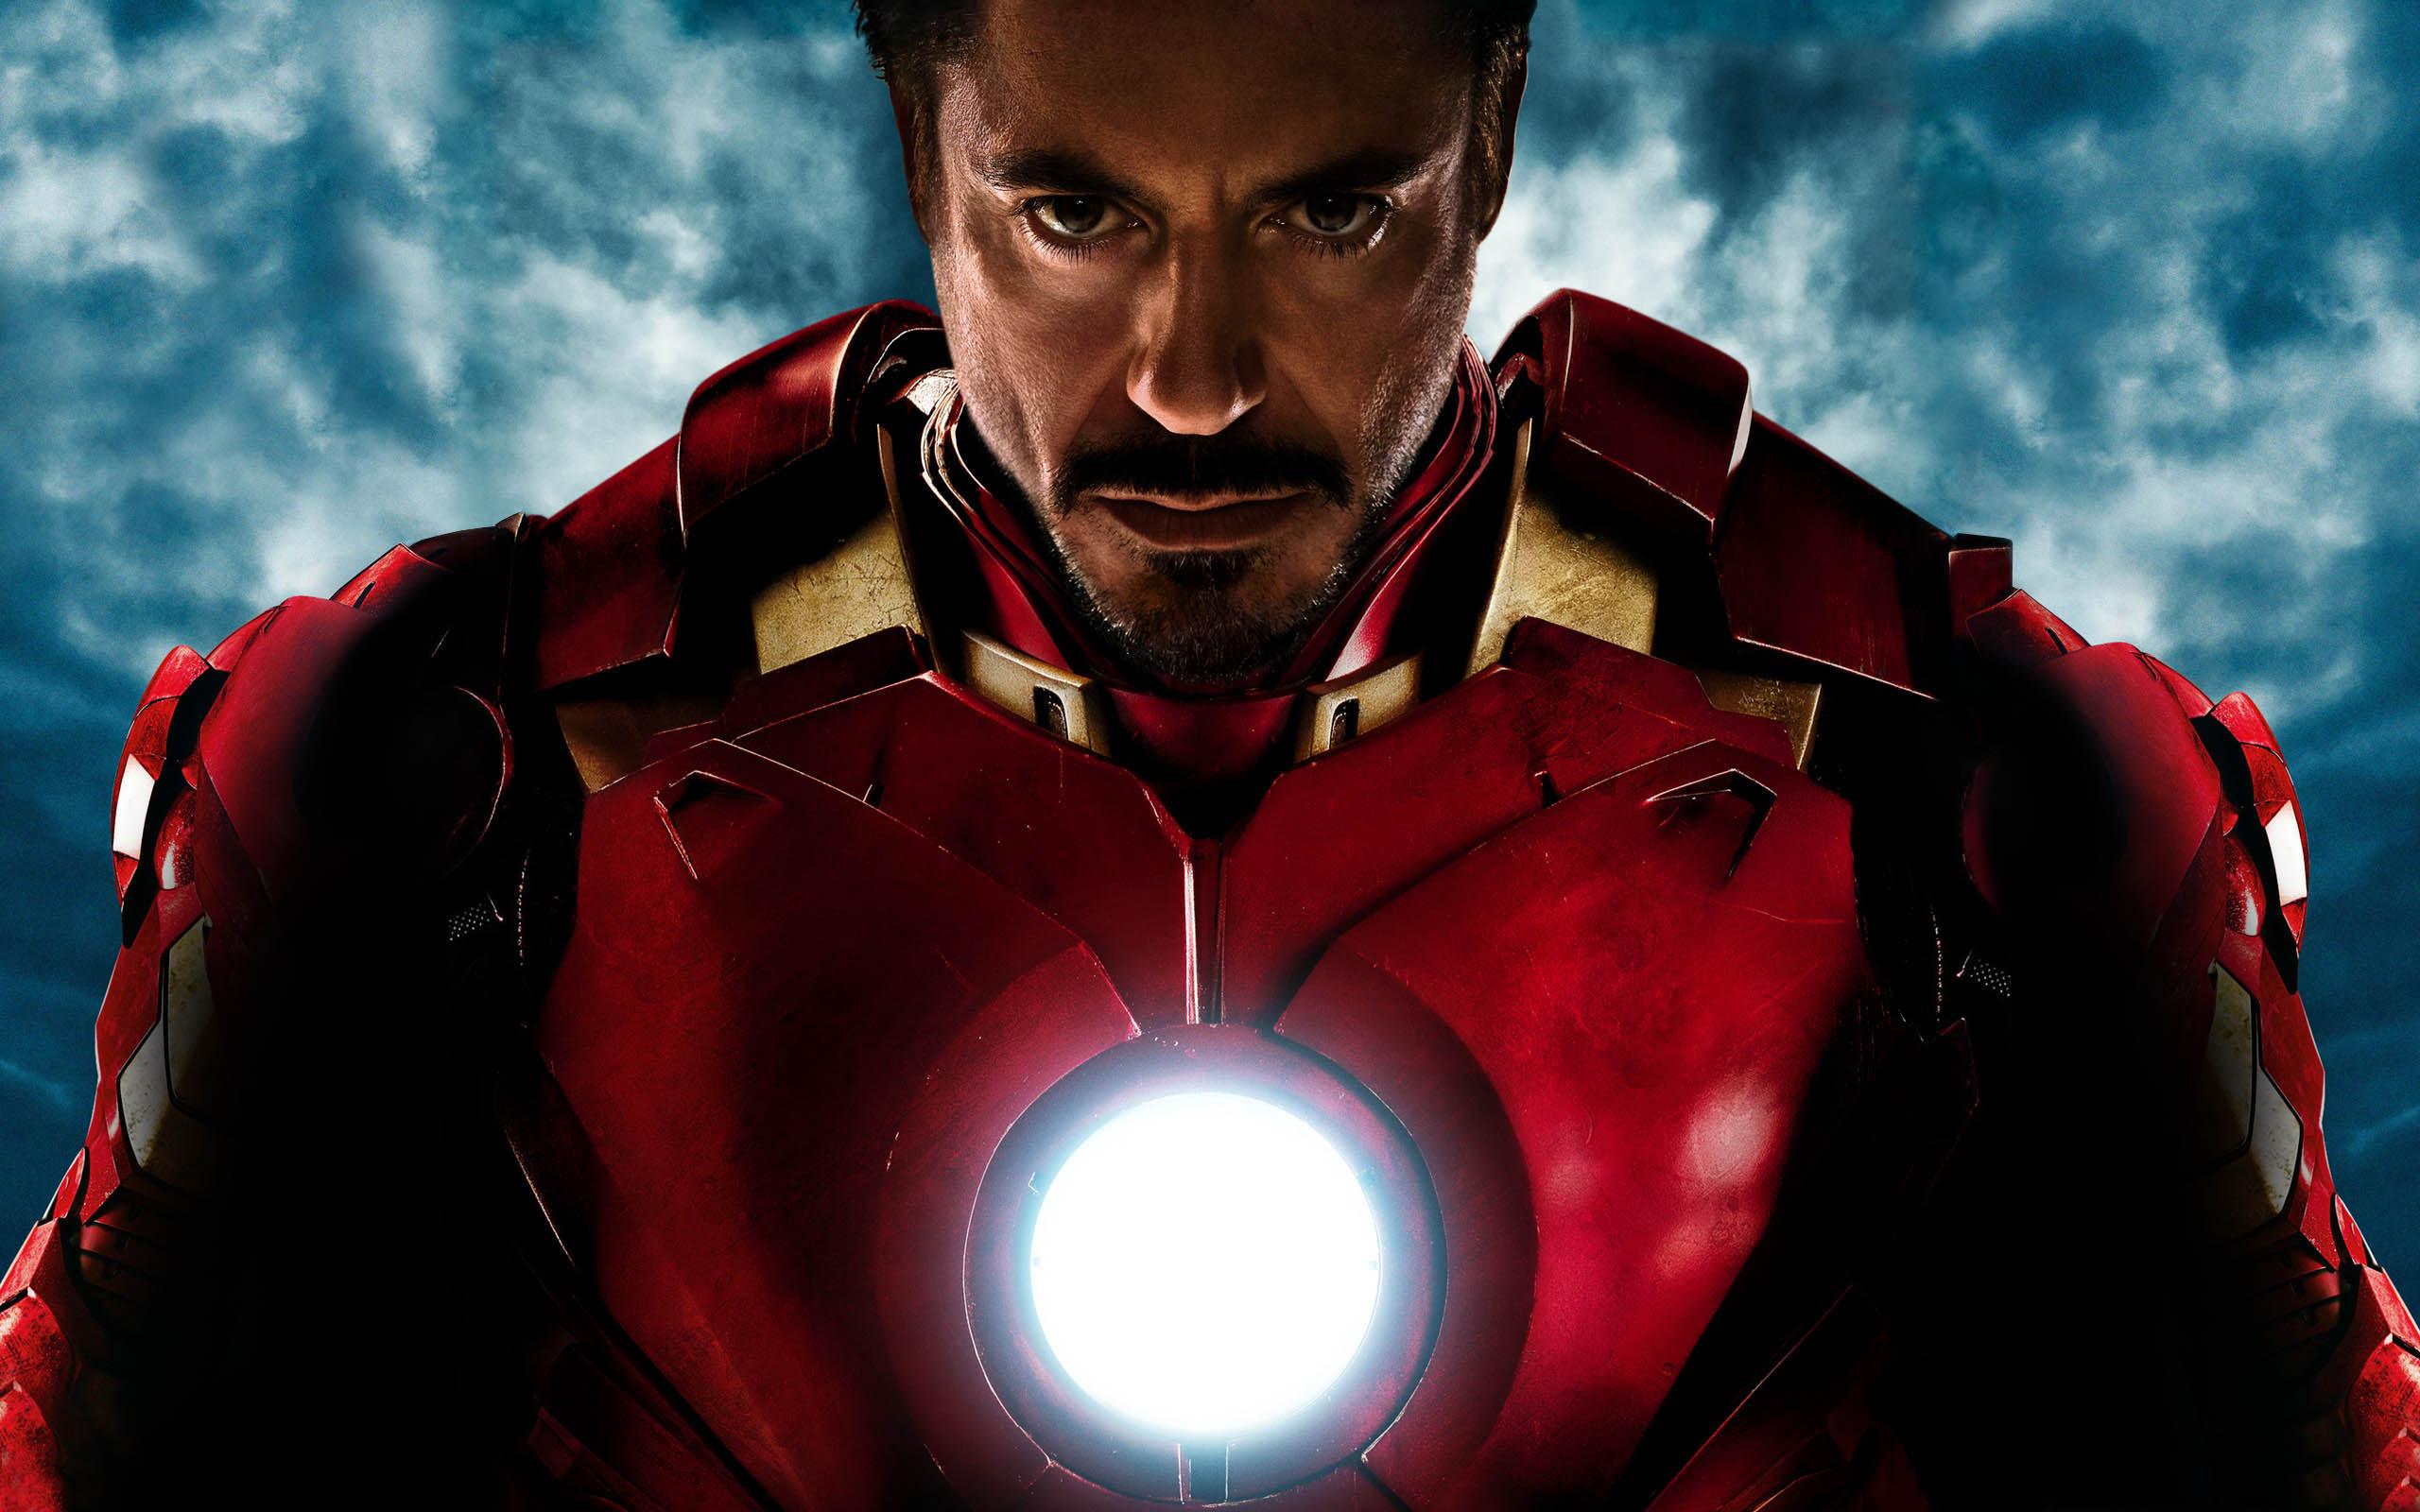 Retrospective review iron man rookerville - Iron man 1 images ...